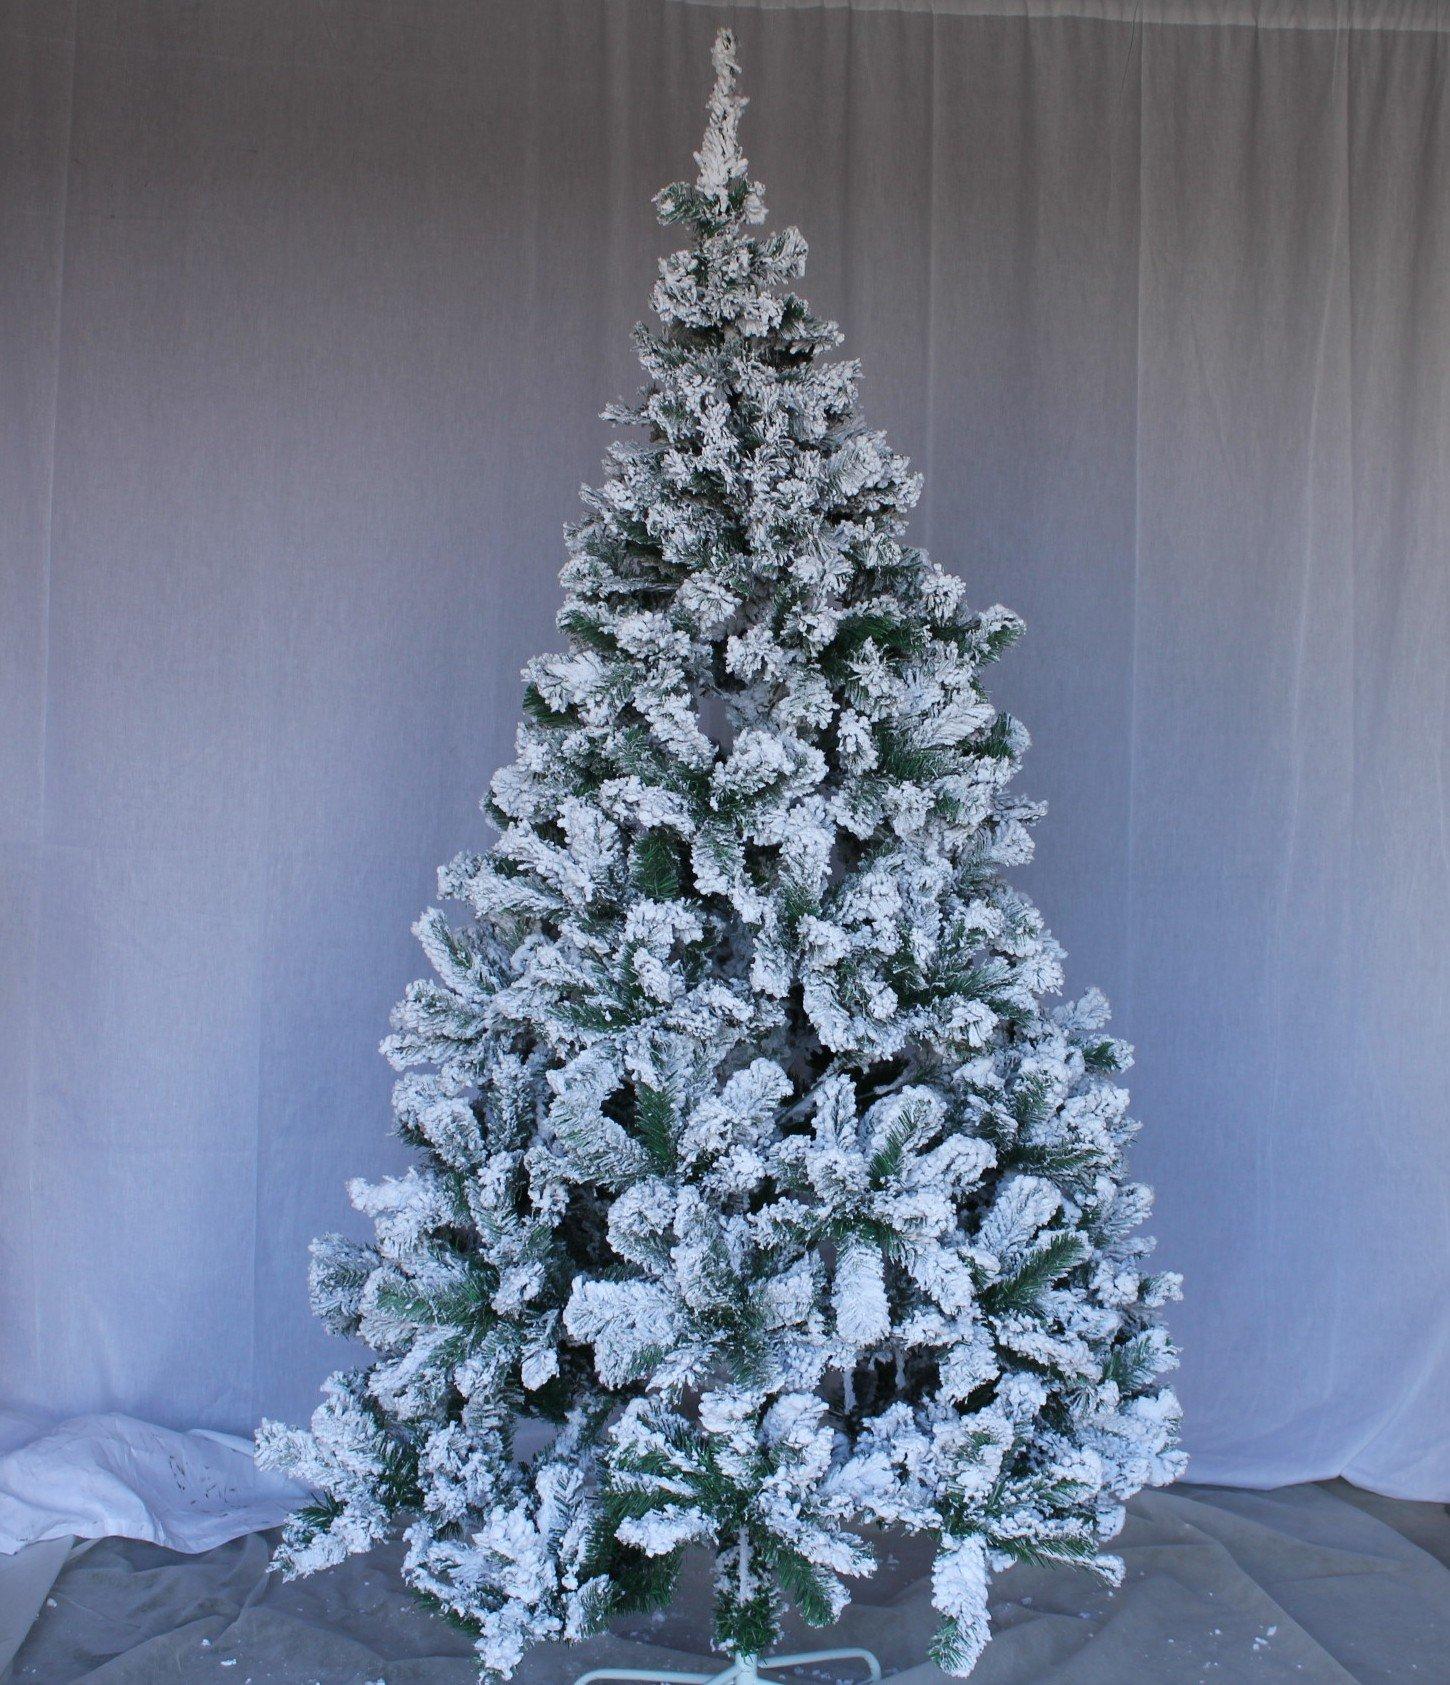 Perfect Holiday Christmas Tree, 5-Feet, Flocked Snow